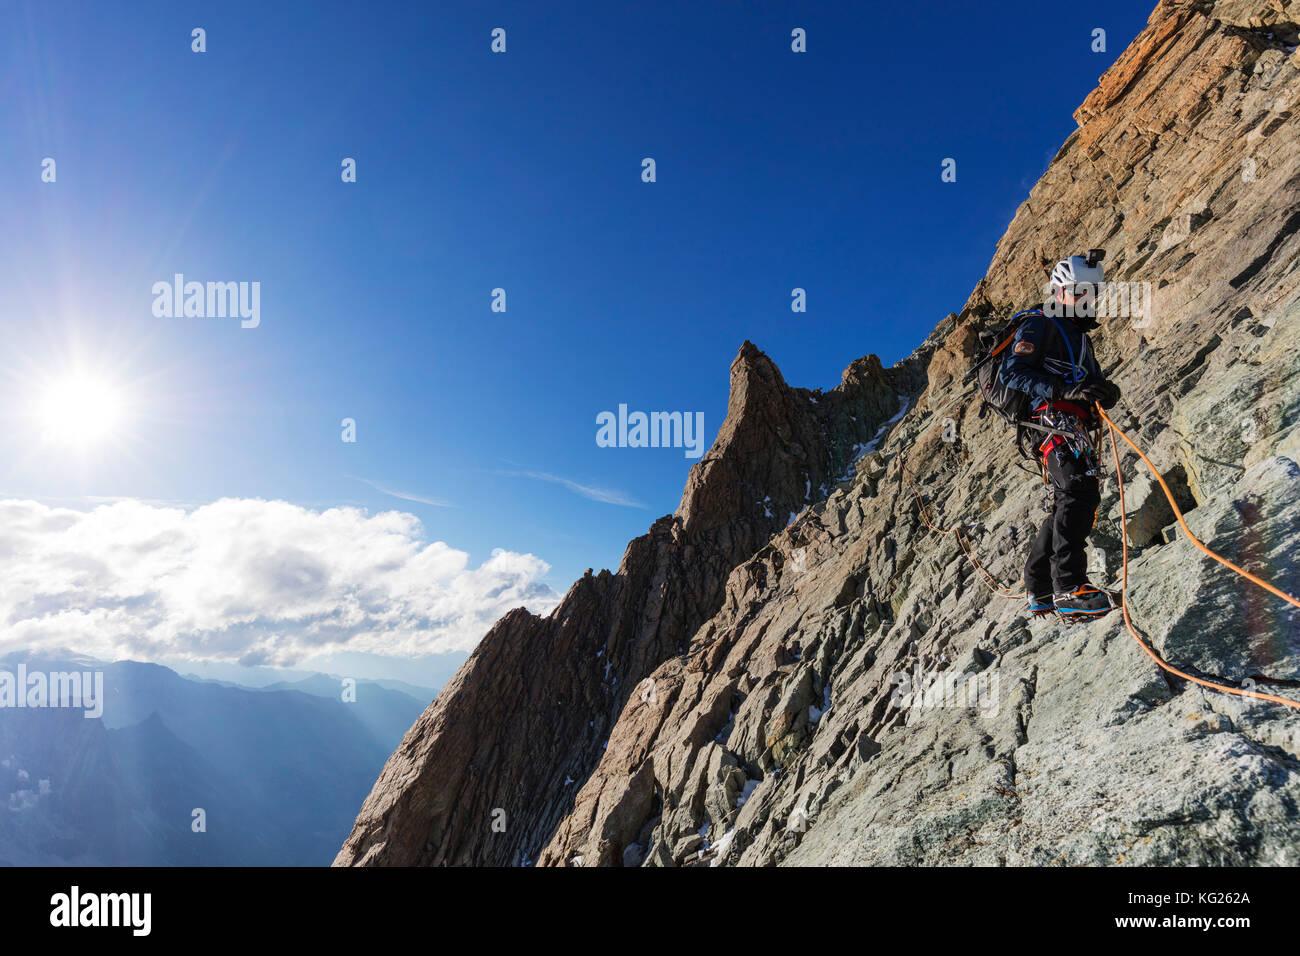 Climber on south ridge of Dent Blanche, 4357m, Valais, Swiss Alps, Switzerland, Europe - Stock Image